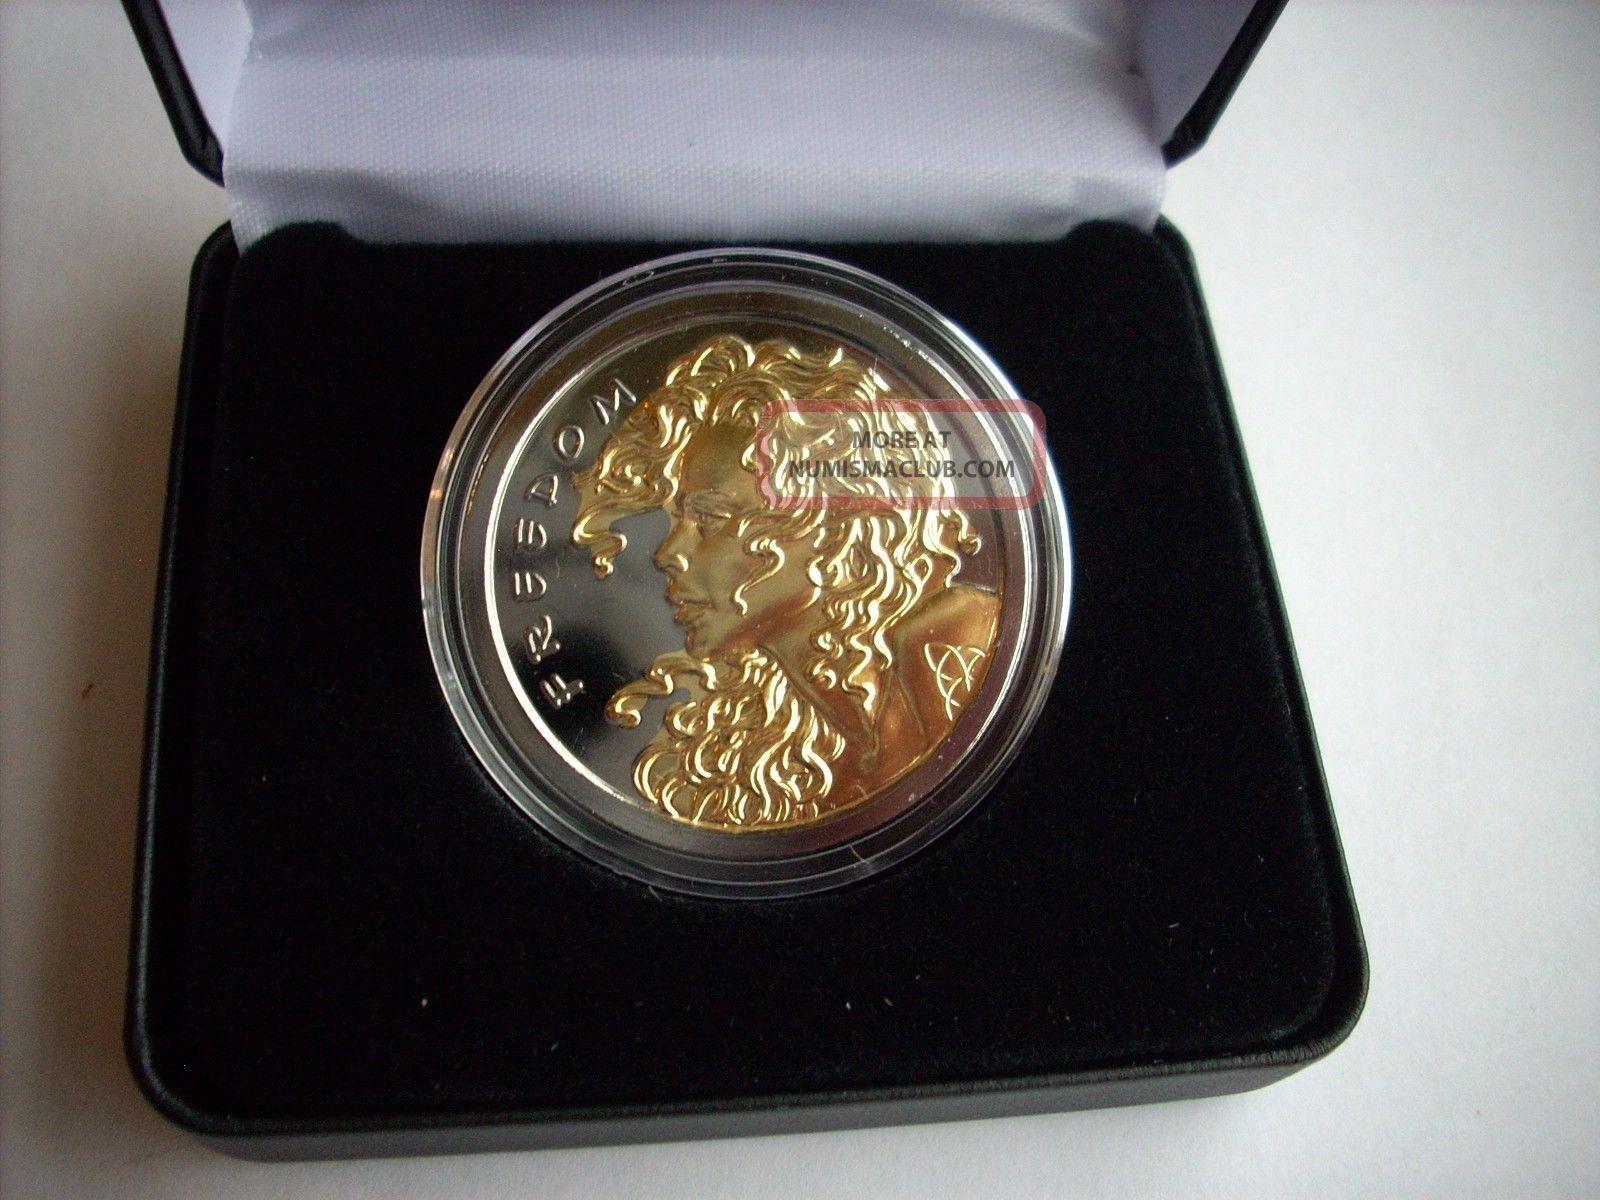 1 Oz Silver Coin Freedom Girl Black Ruthenium 24kt